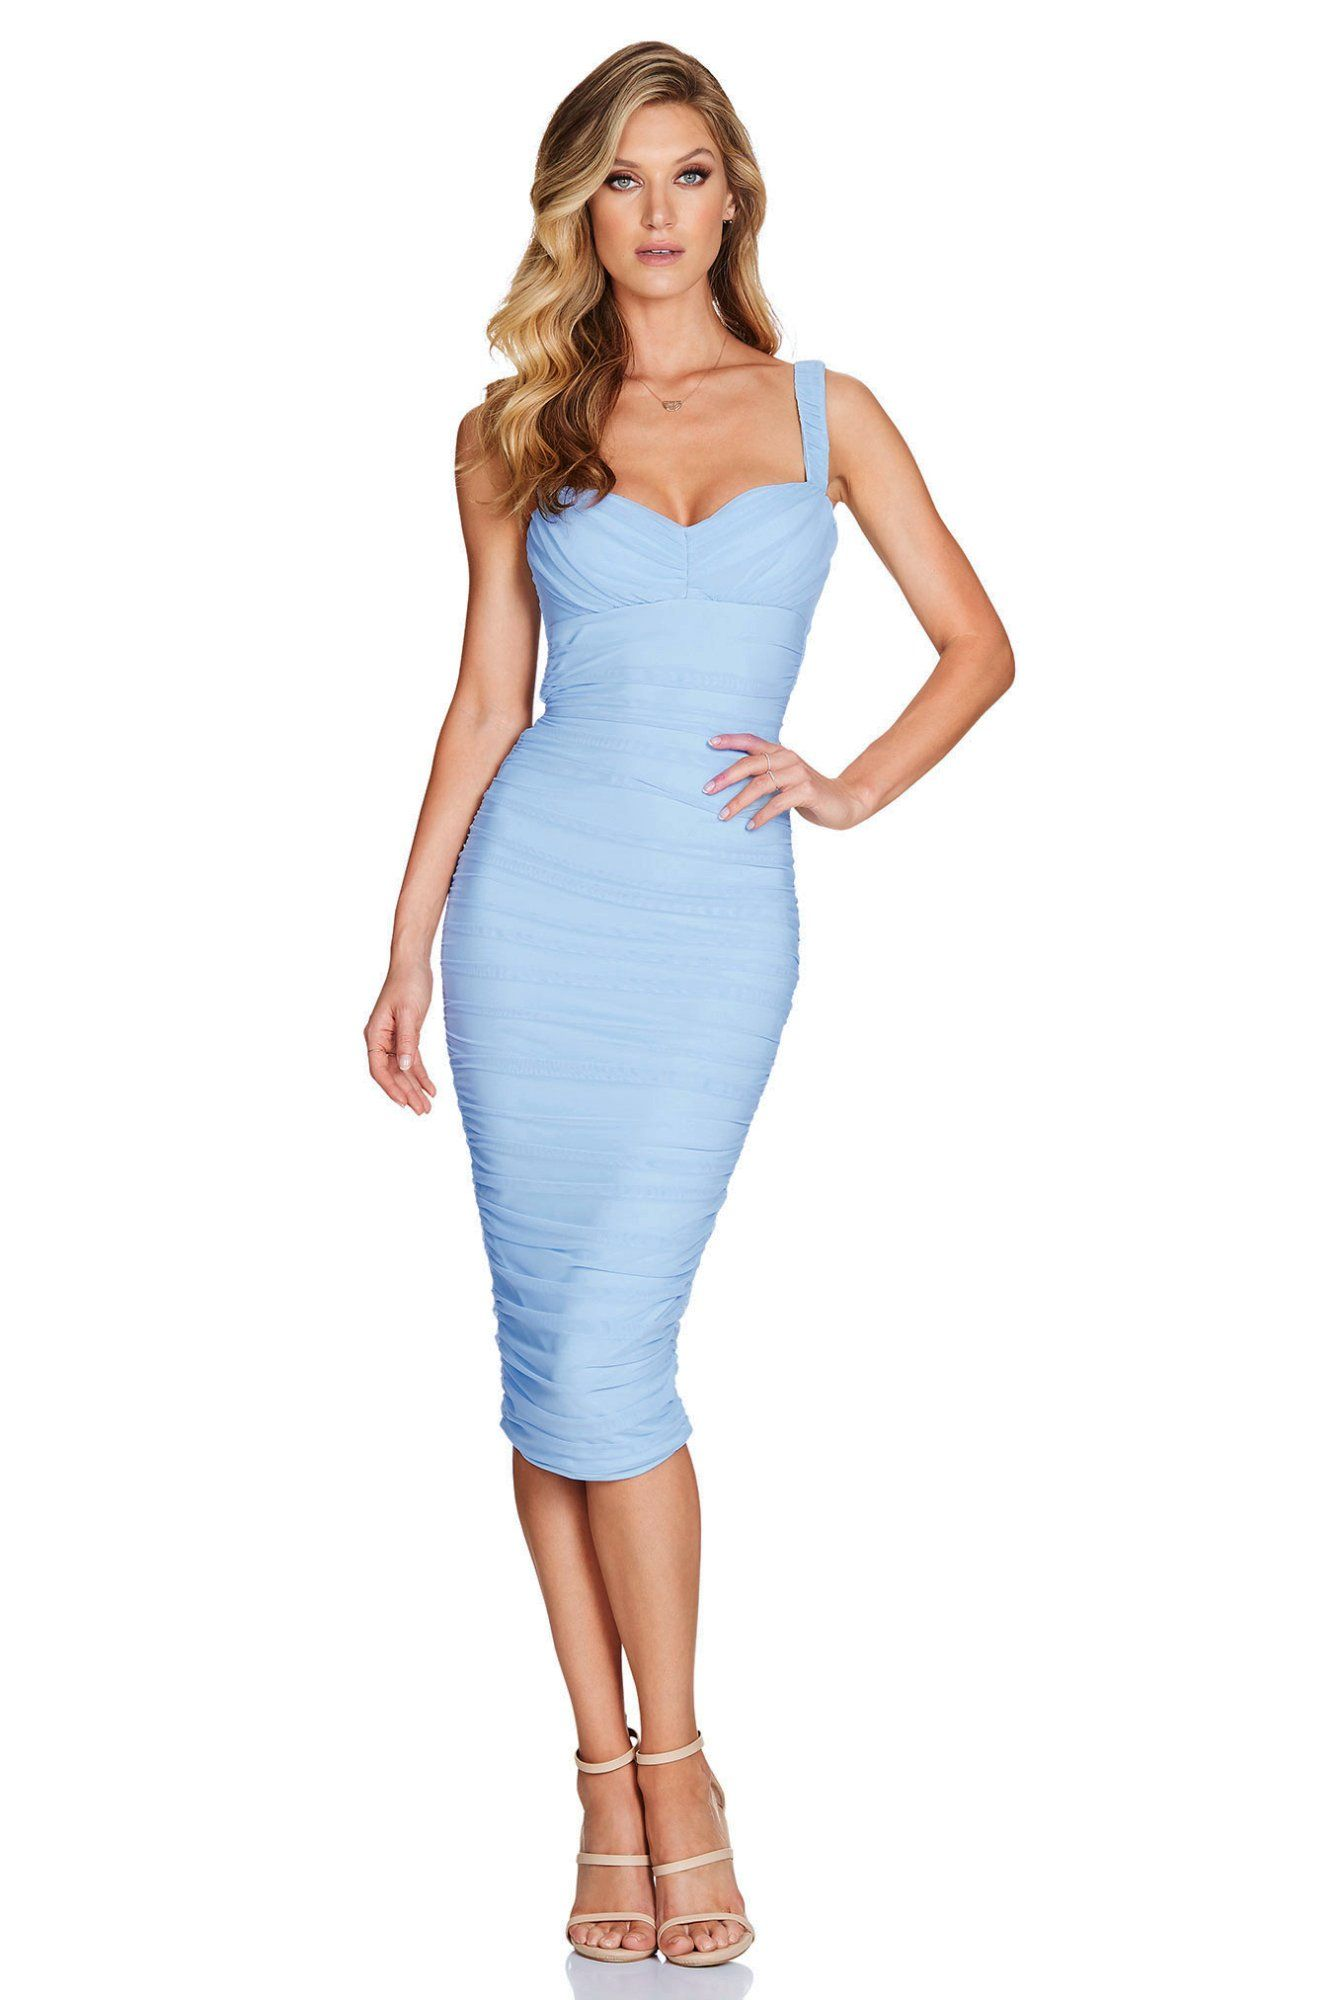 Melody Mesh Sweetheart Midi Dress In 2021 Dresses Bandage Midi Dress Blue Cocktail Dress [ 2000 x 1333 Pixel ]